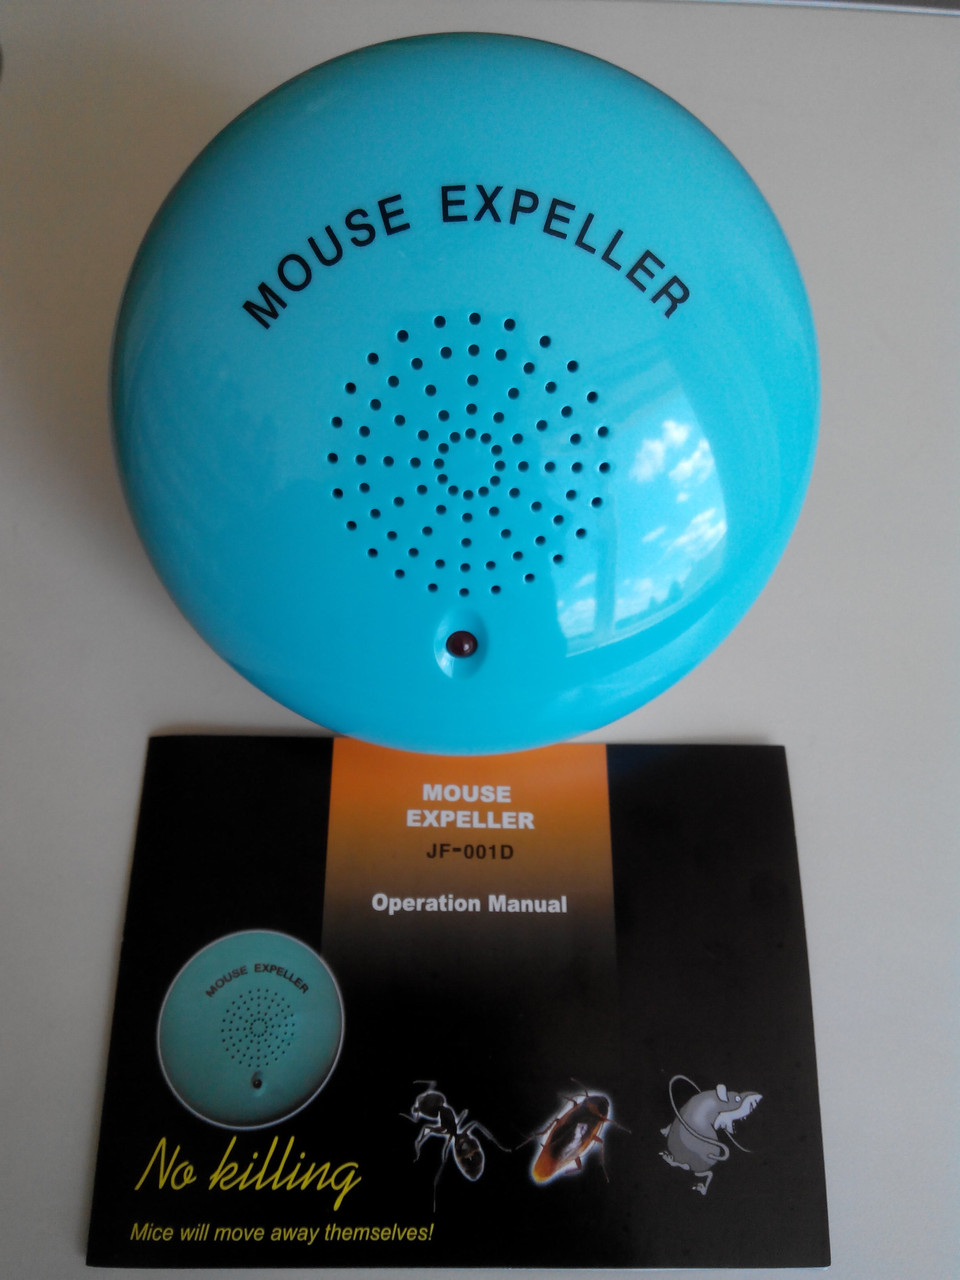 Ультразвуковий відлякувач гризунів (Ультразвуковой отпугиватель) Mouse Expeller JF-001D - ТЕКС-МАСТЕР в Черкассах